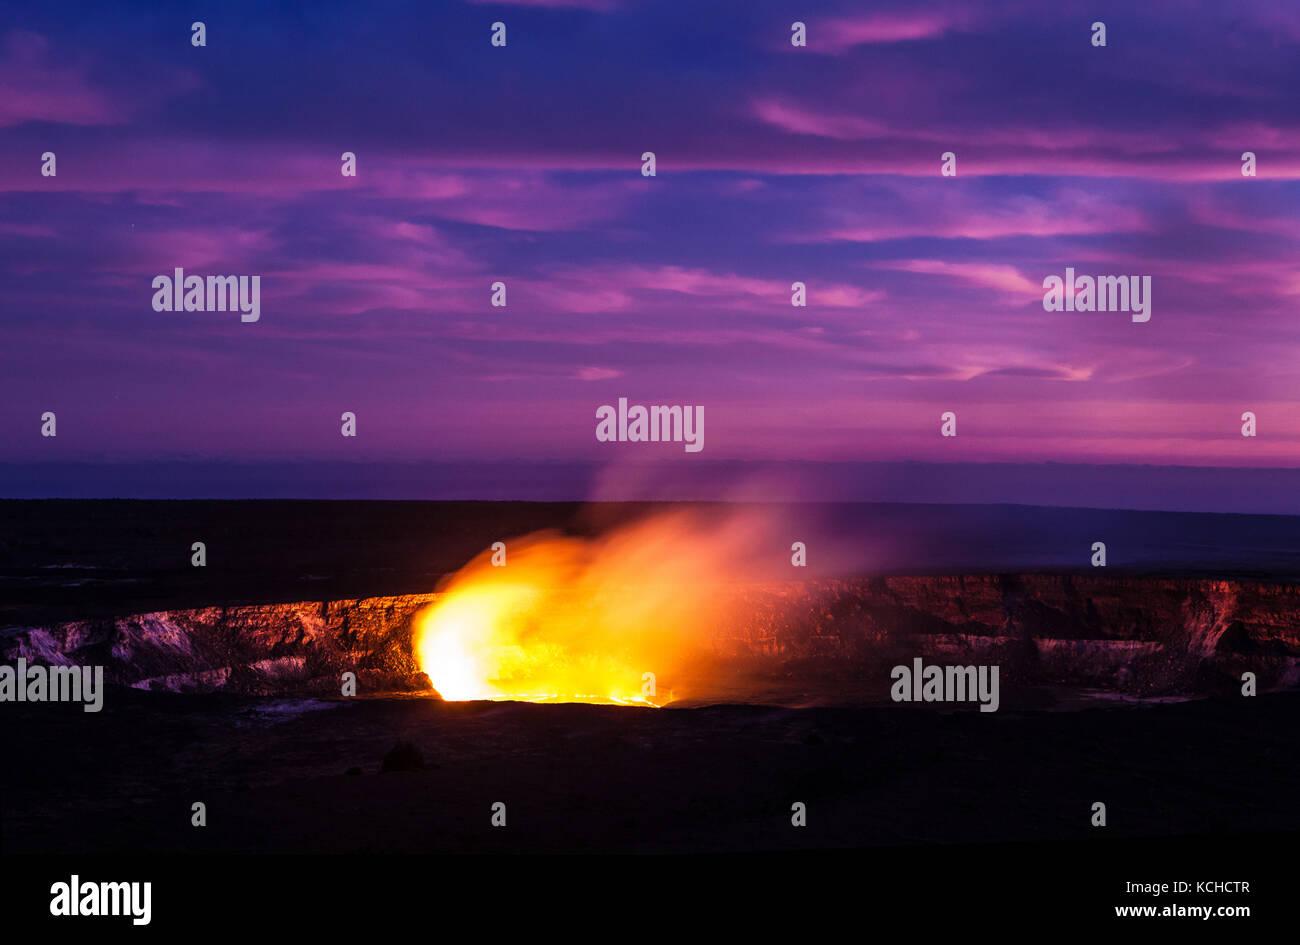 Eruption, Halema'uma'u Crater of Kilauea Volcano in the evening, Island of Hawaii - Stock Image